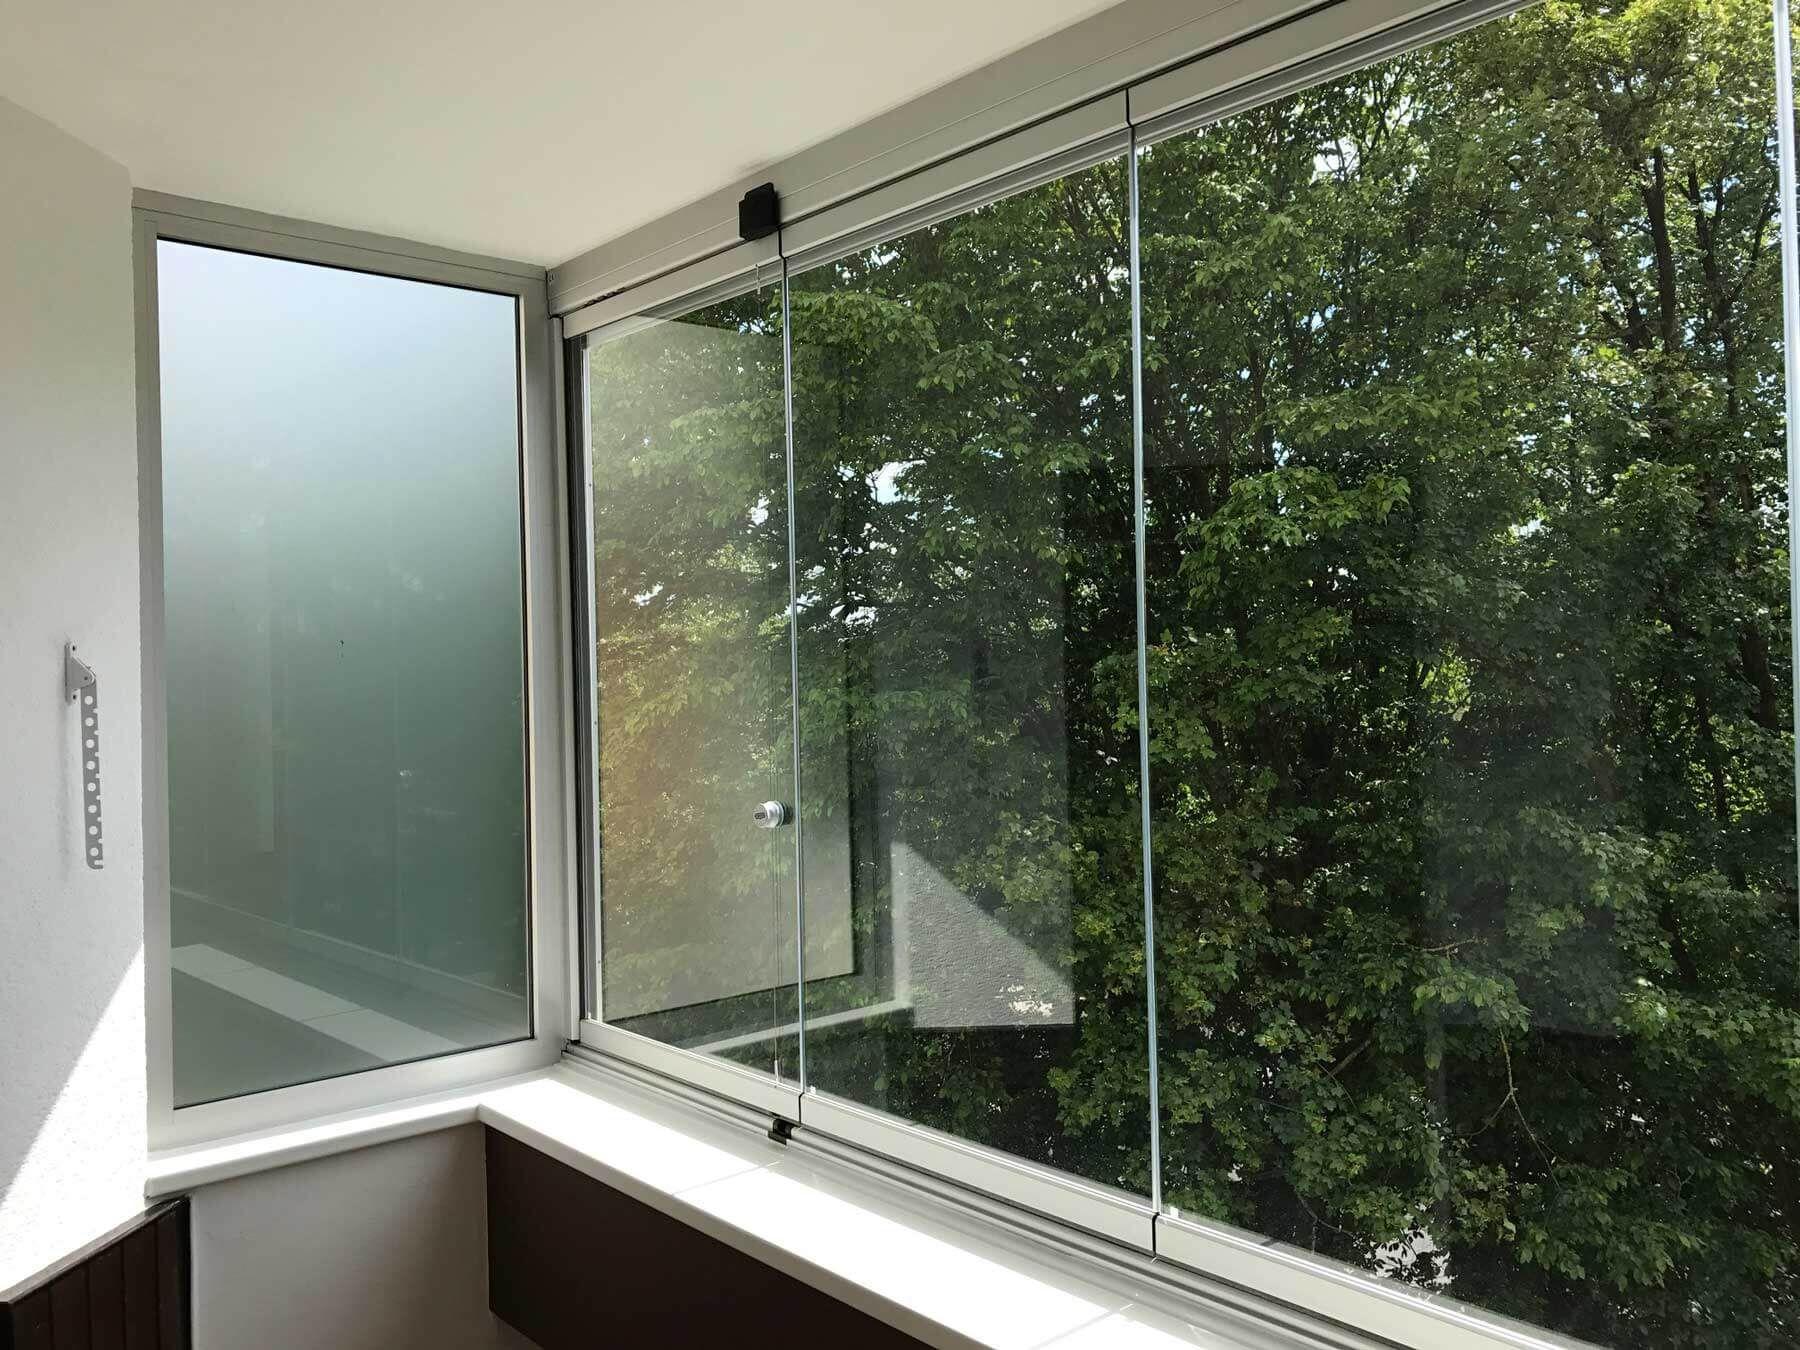 Balkonverkleidung Glas Faltbar Verglasungen Balkon Terrasse